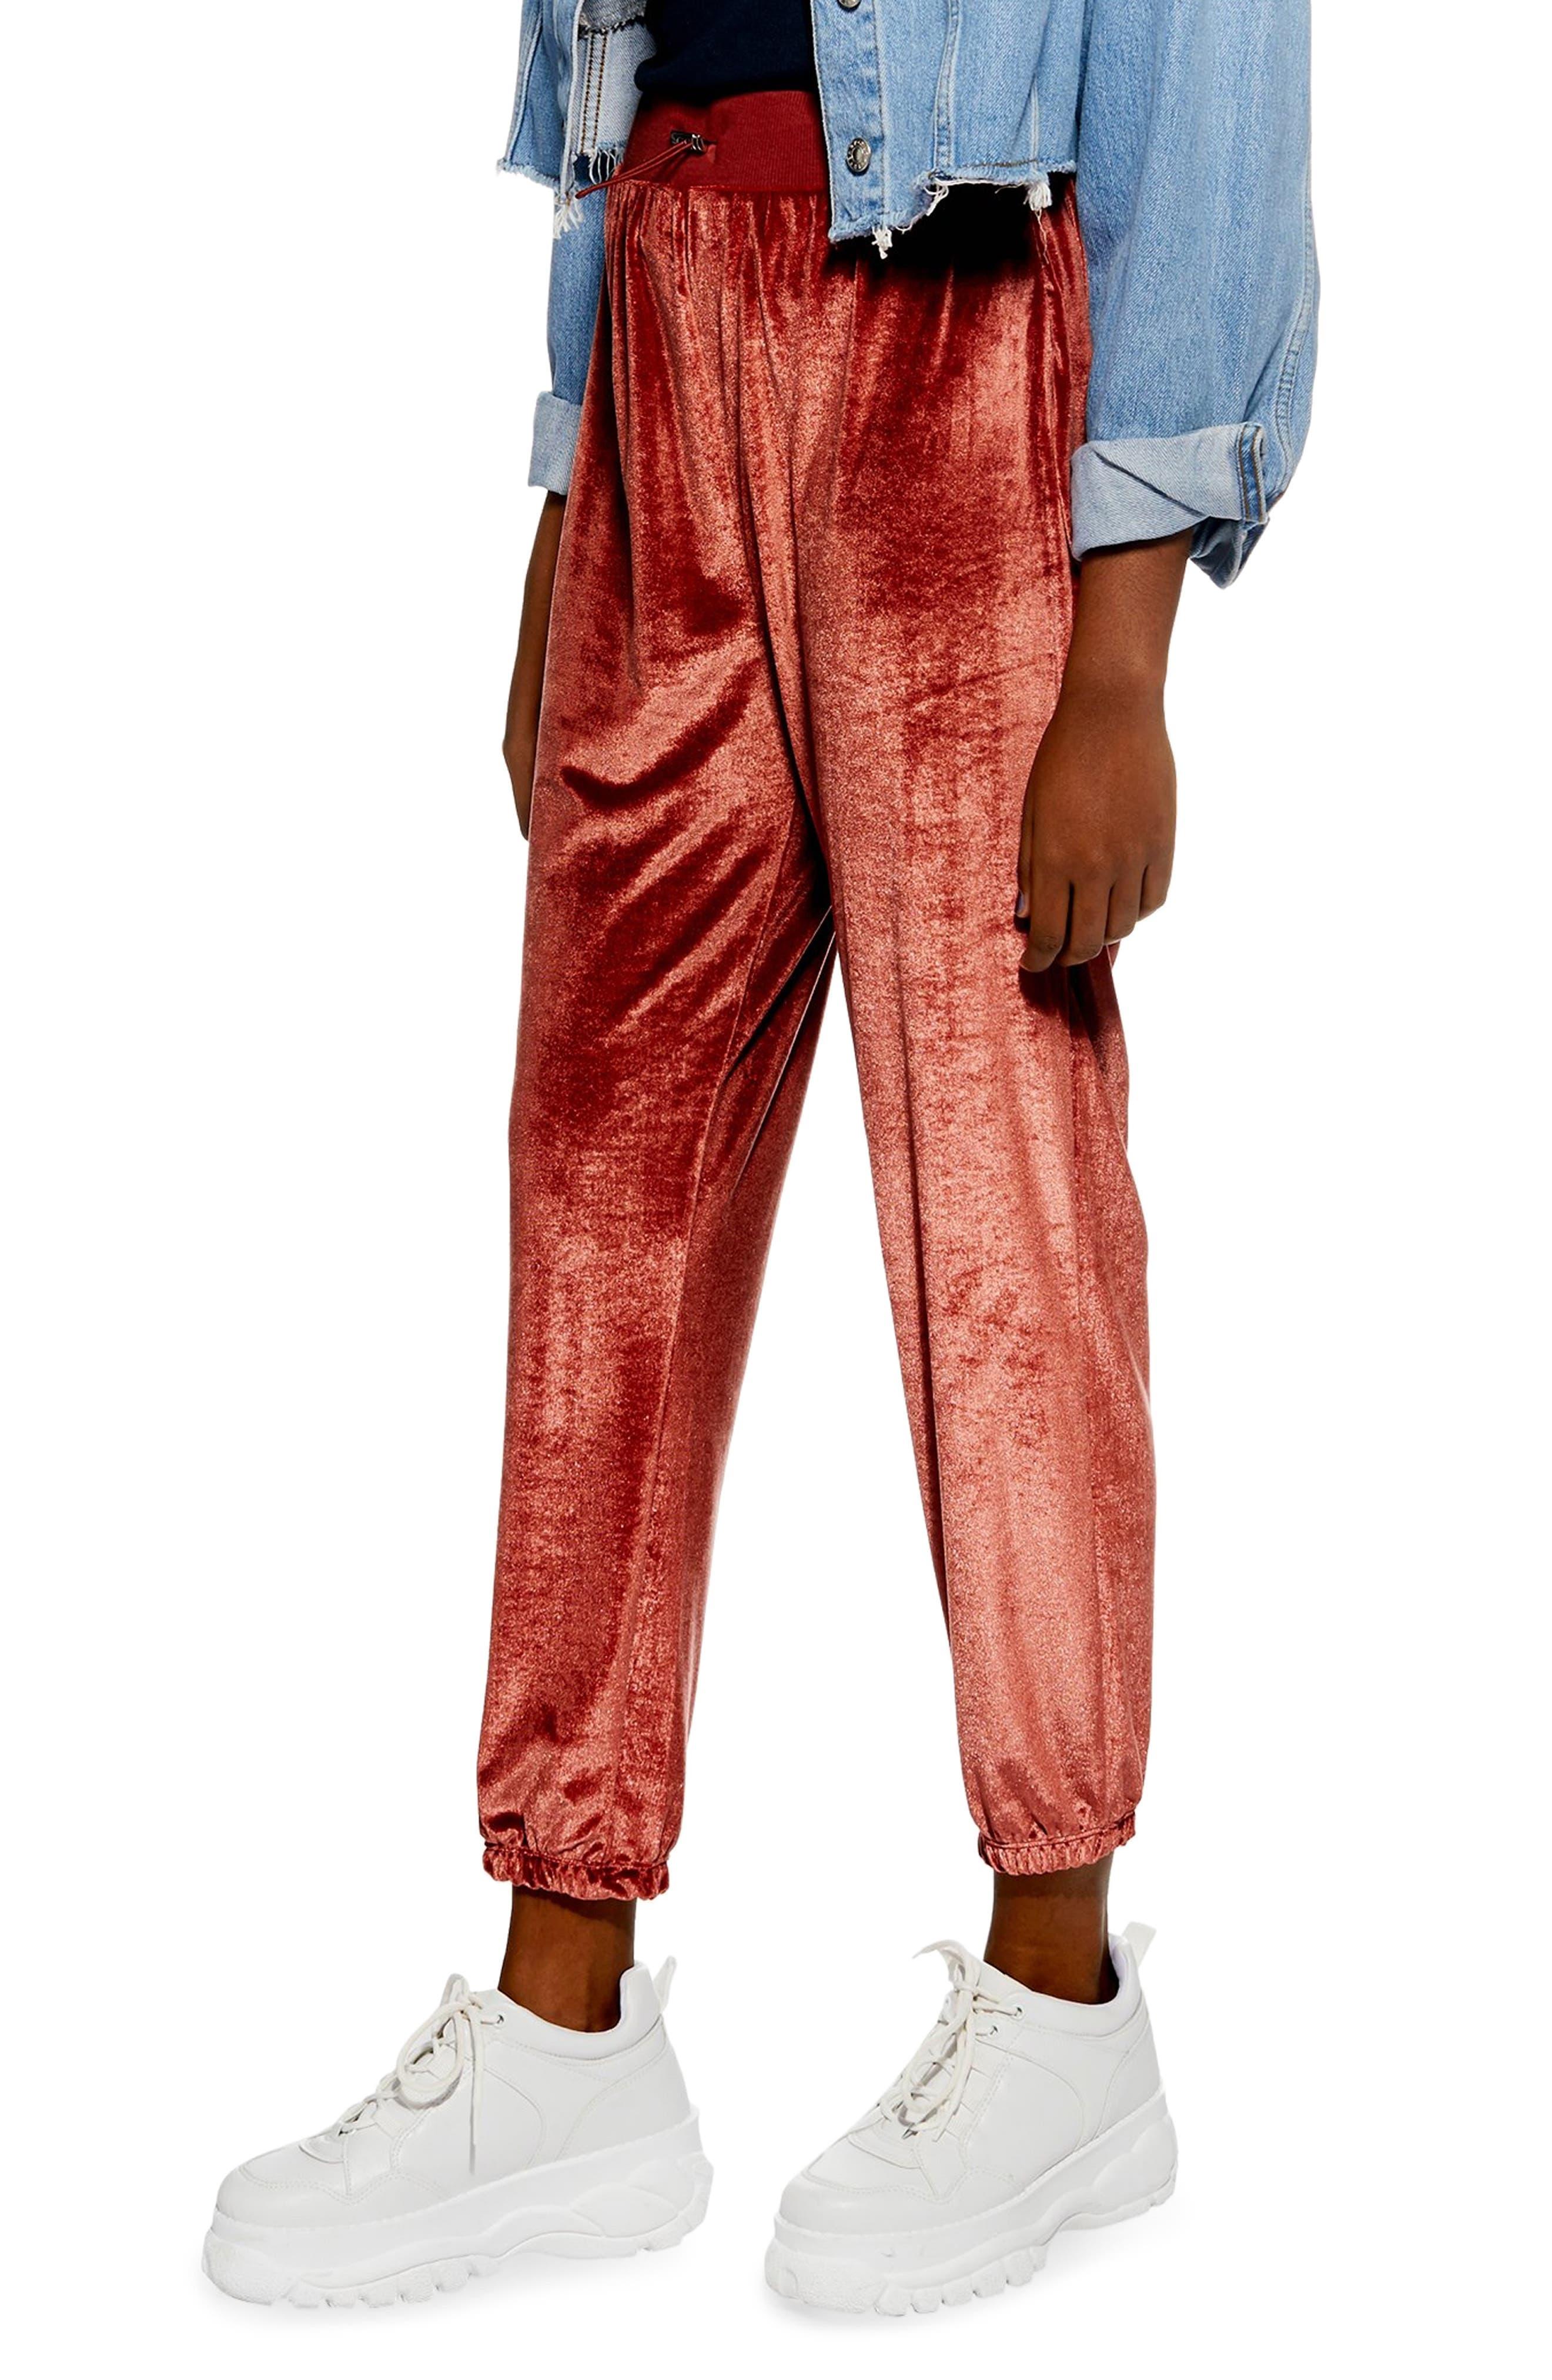 Velour Jogger Pants,                             Main thumbnail 1, color,                             ROSE GOLD